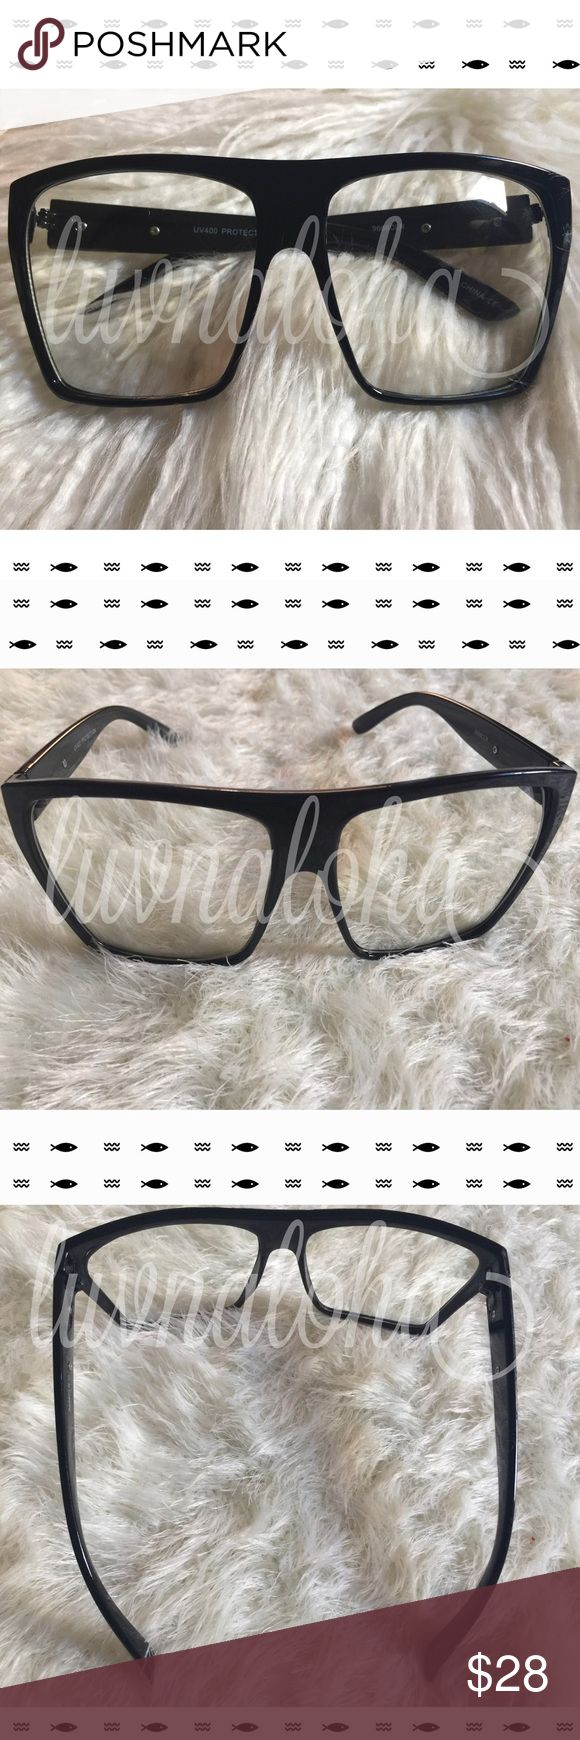 discount designer eyeglass frames